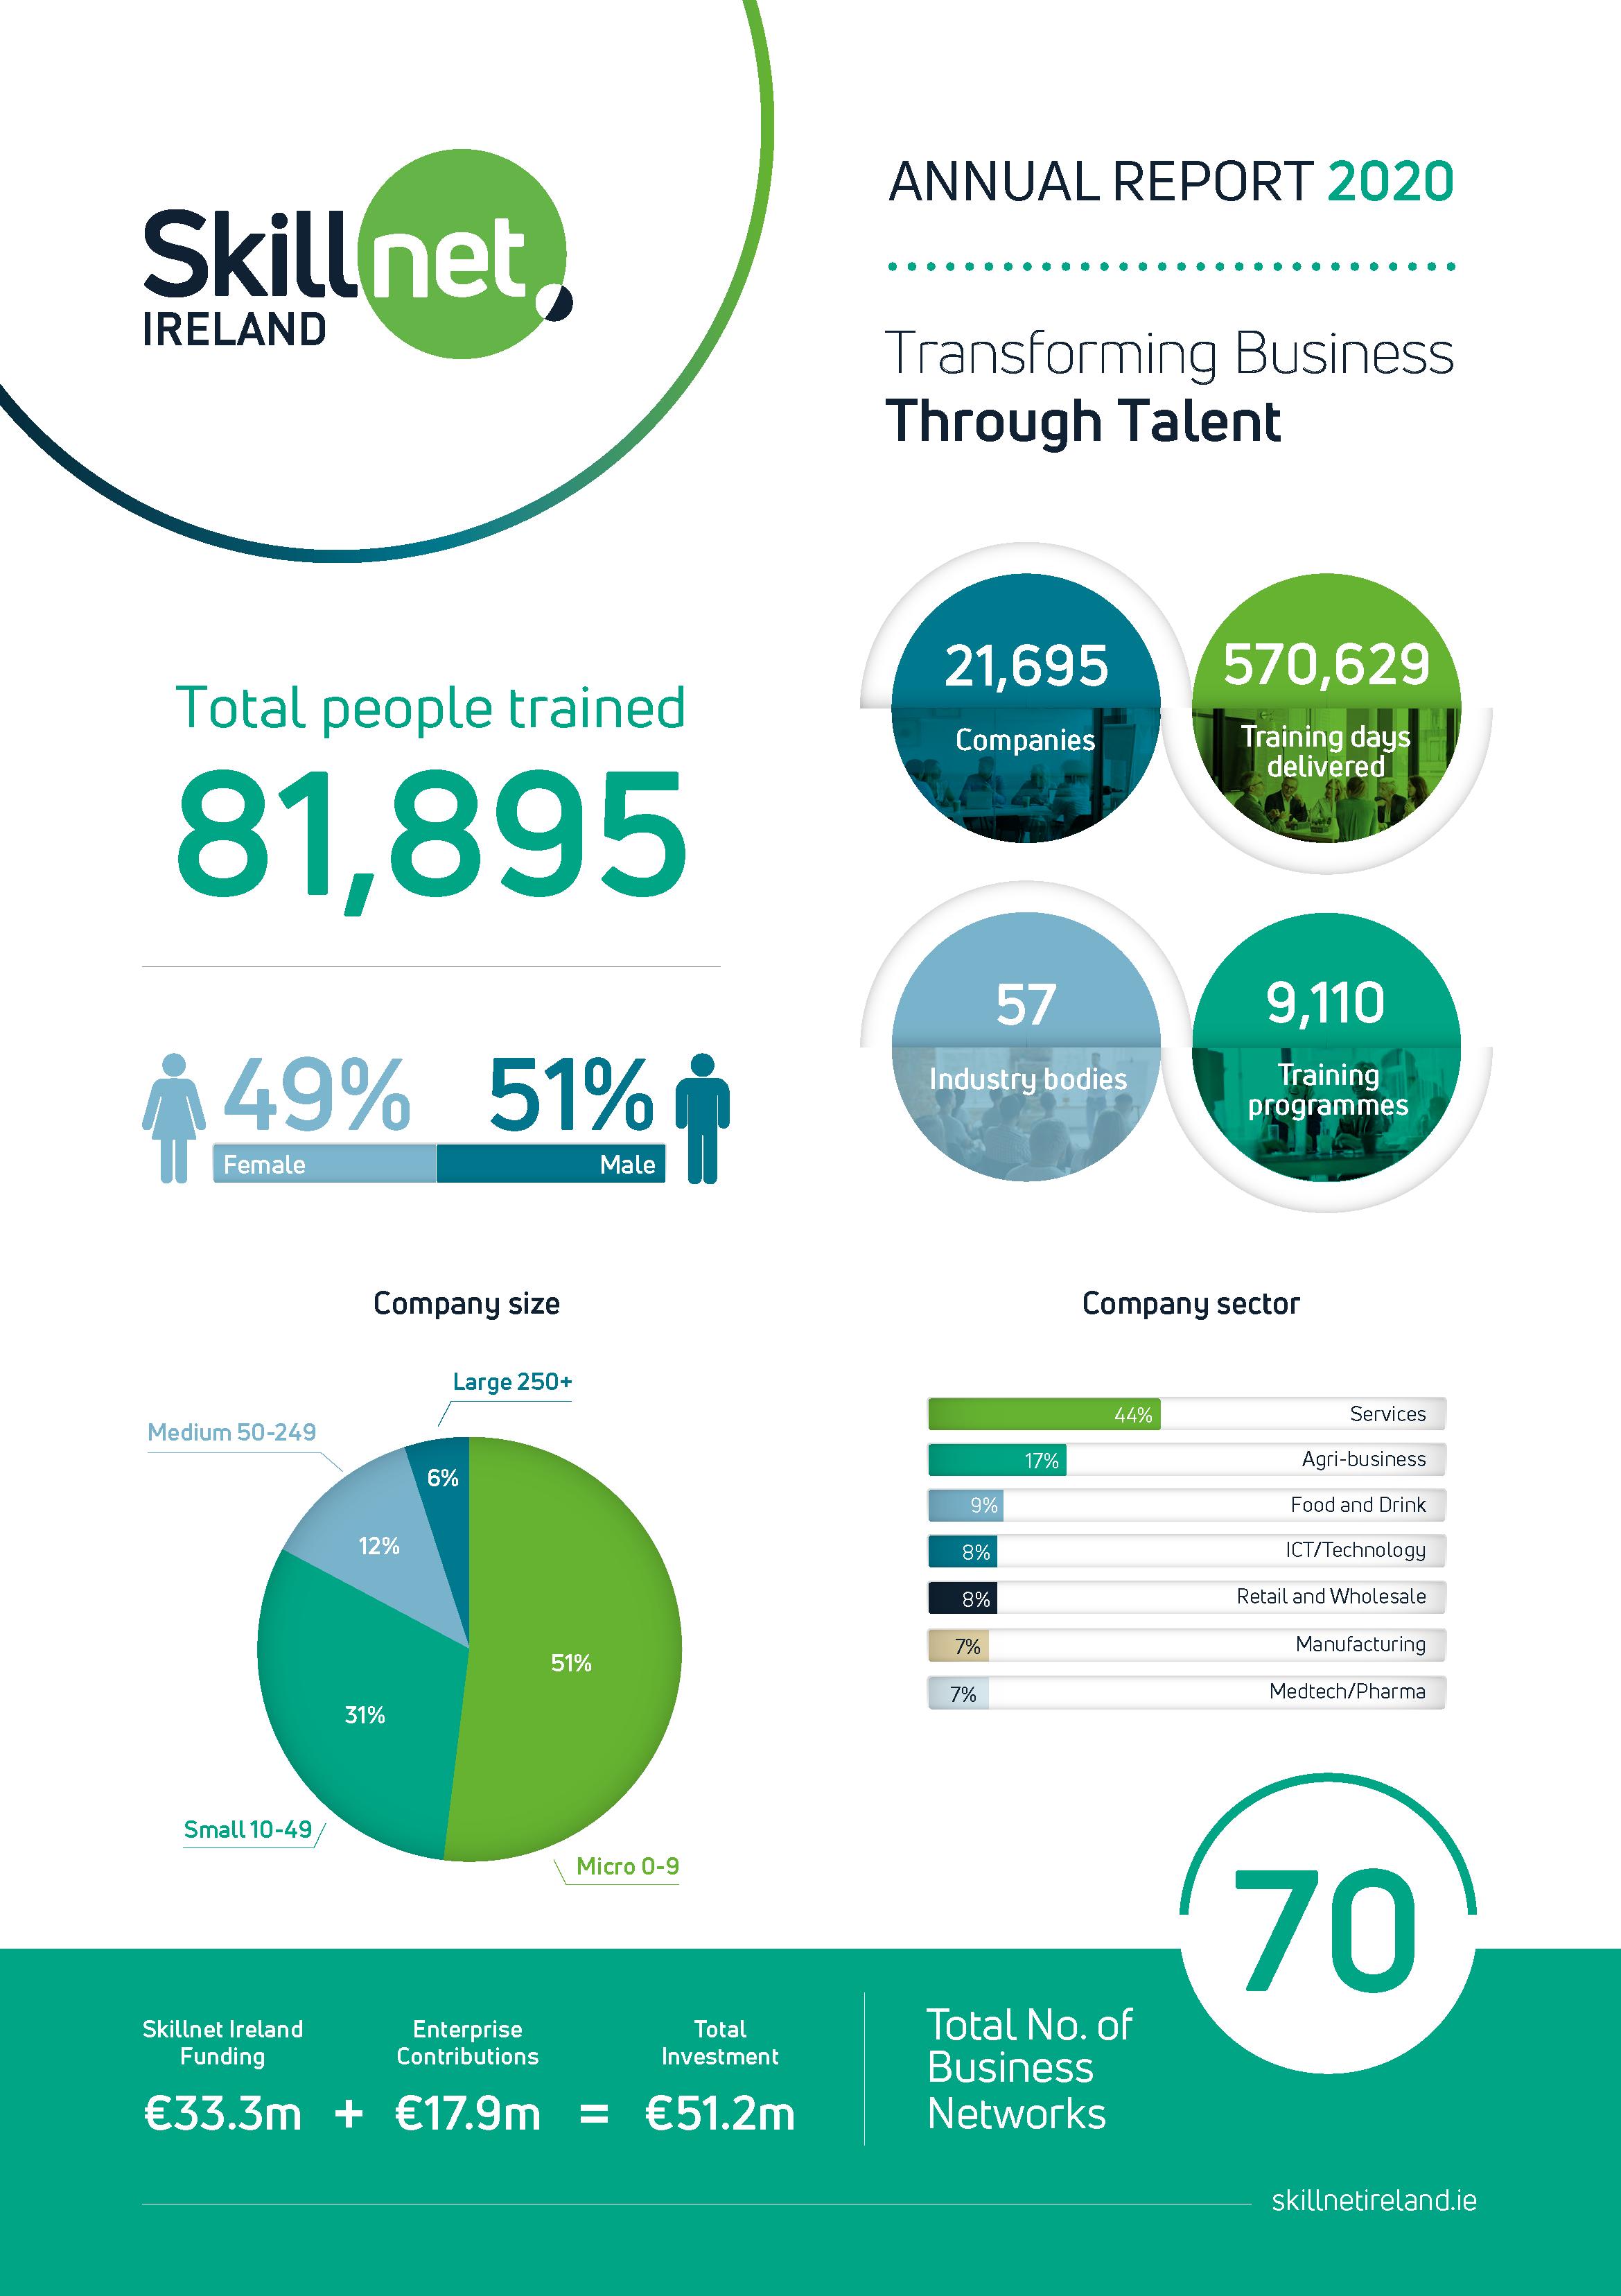 Skillnet Ireland Annual Report 2020 Infographic image